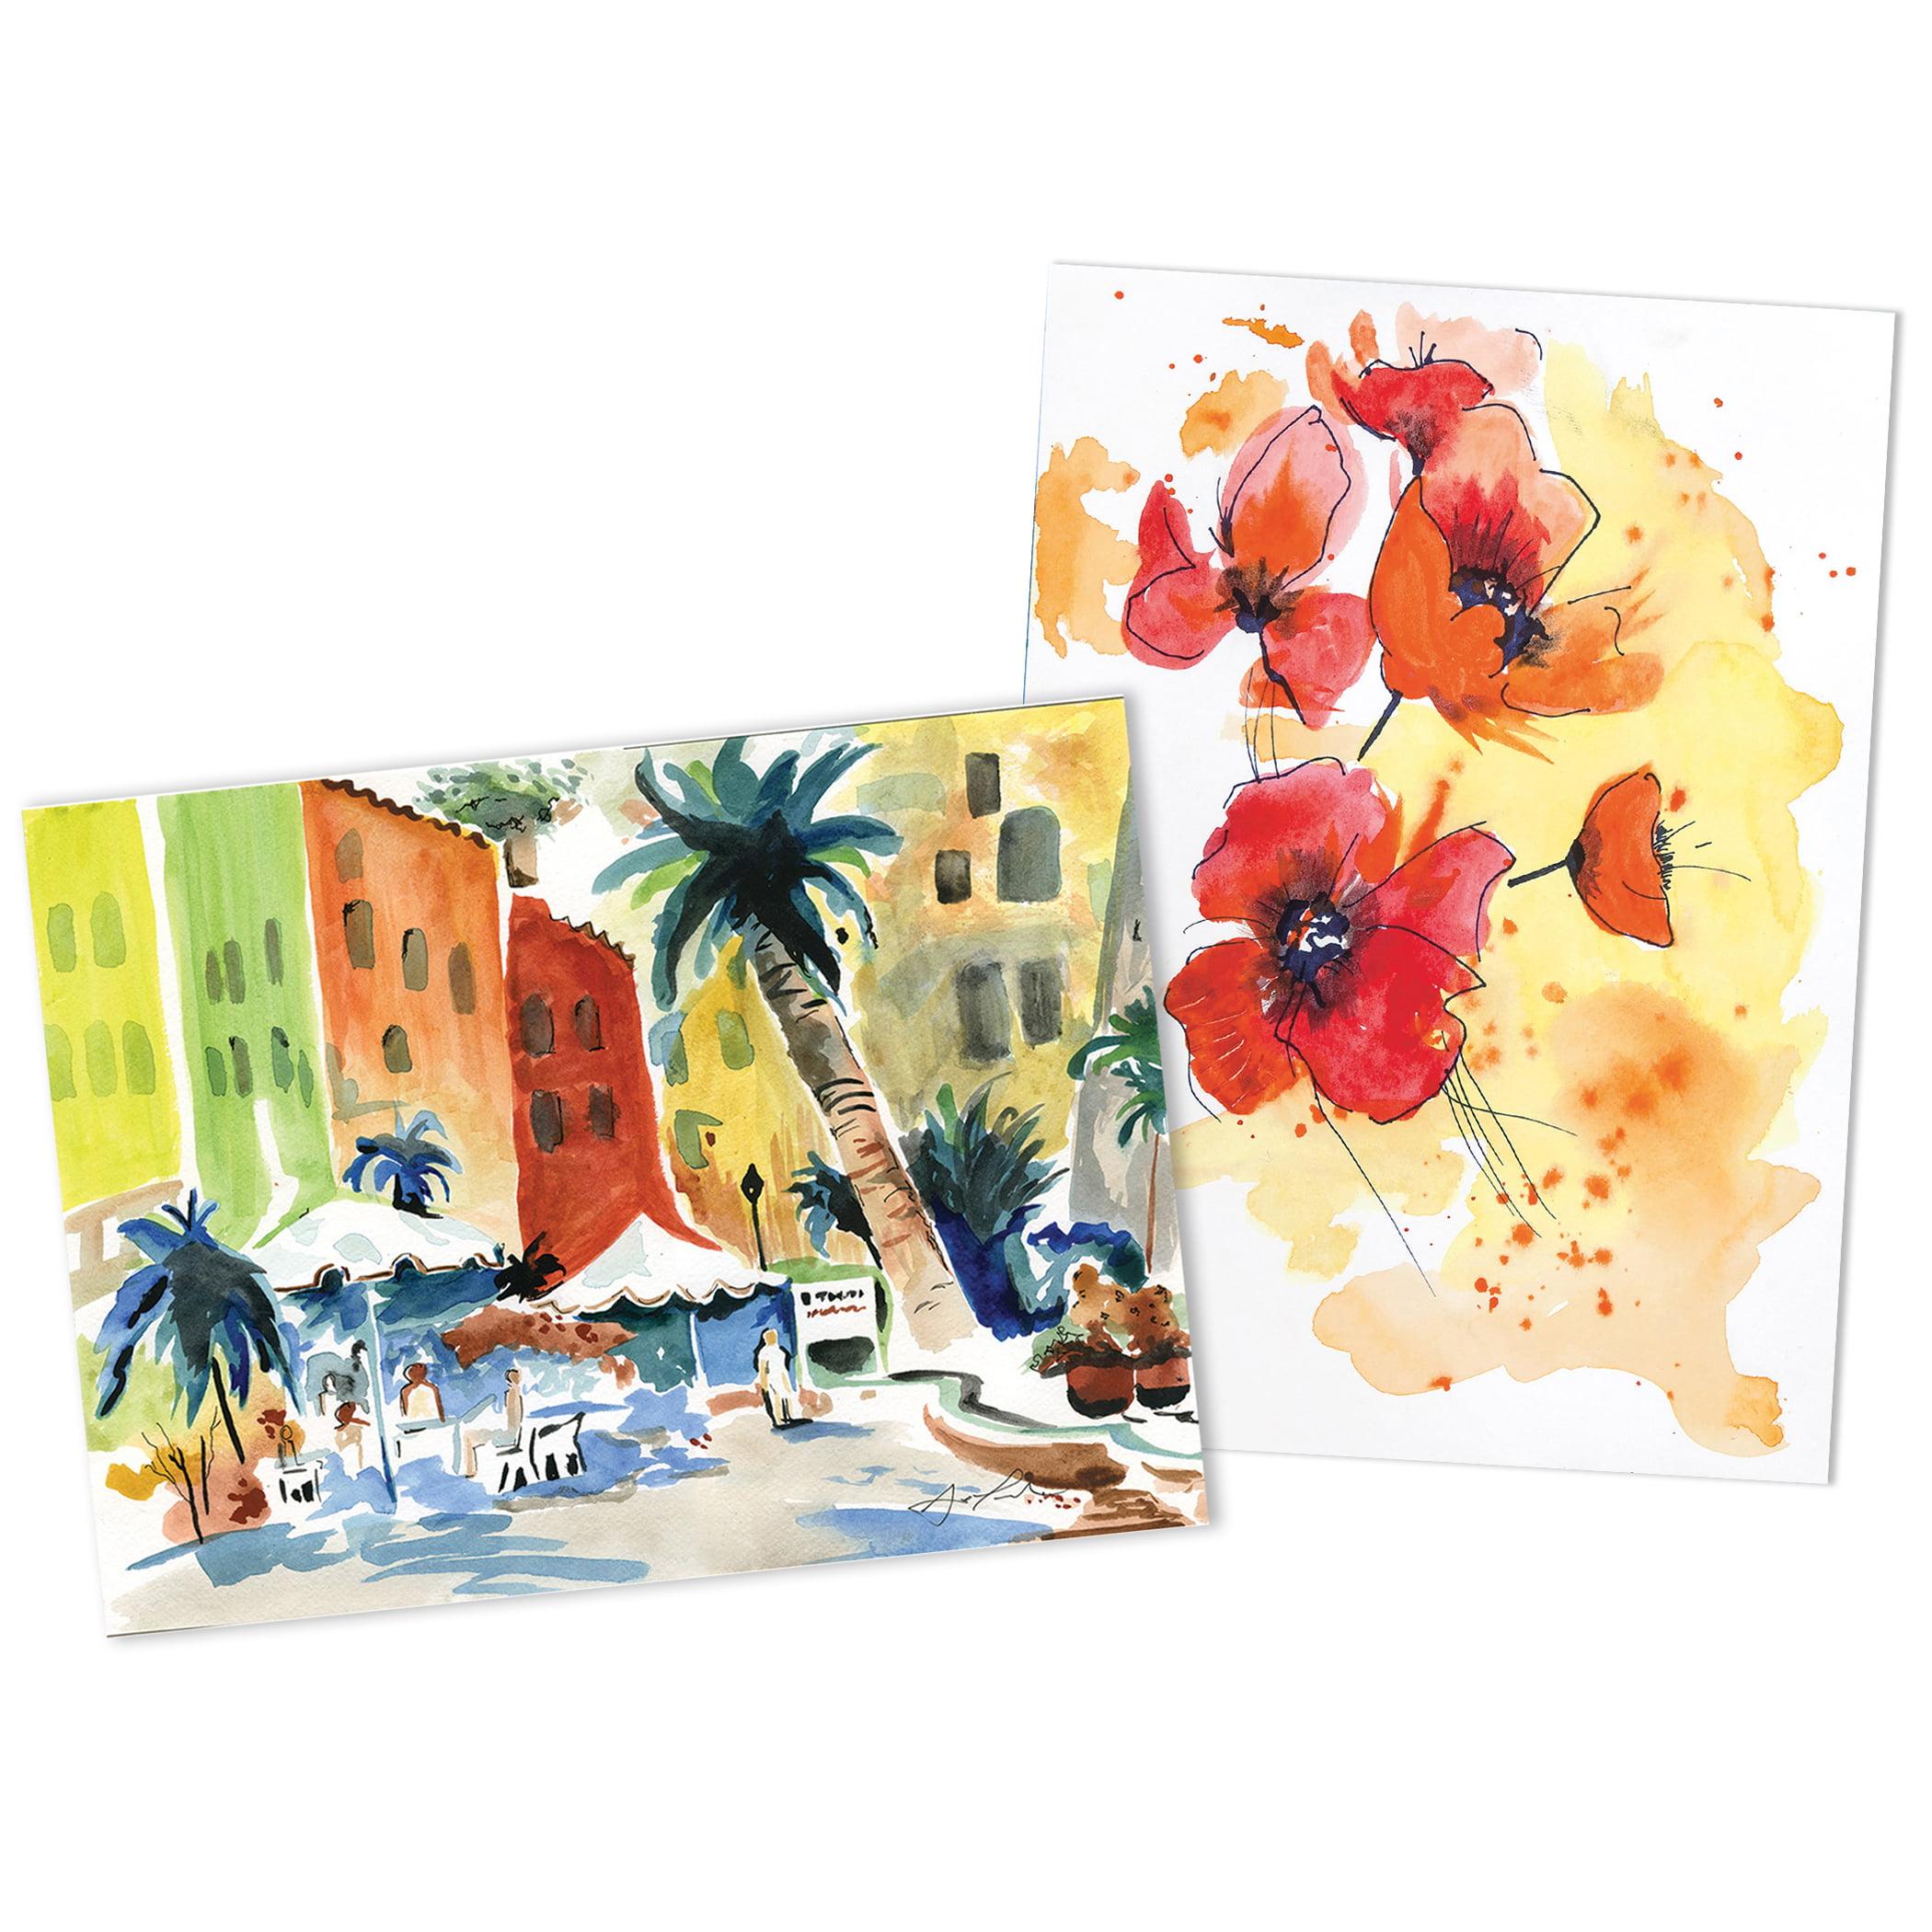 "Art1st® Watercolor Paper, 18"" x 24"", 50 Sheets"